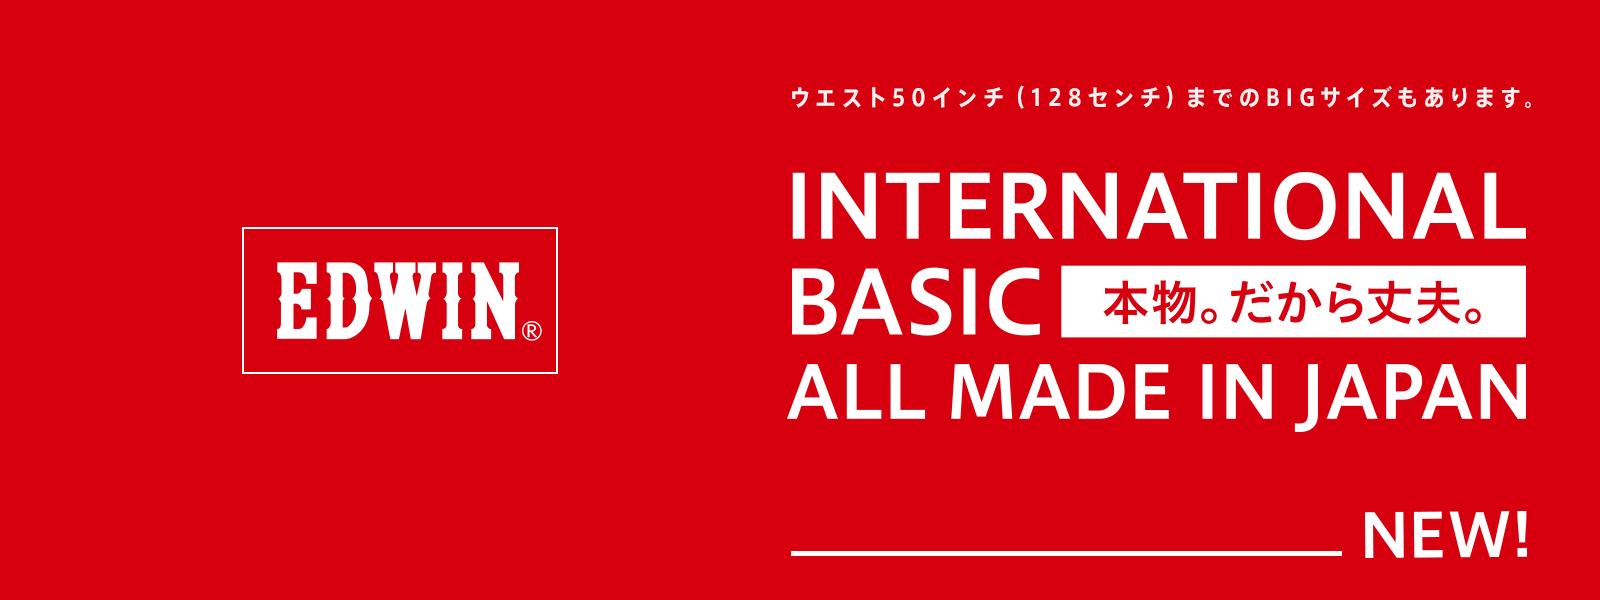 EDWIN INTERNATIONAL BASIC